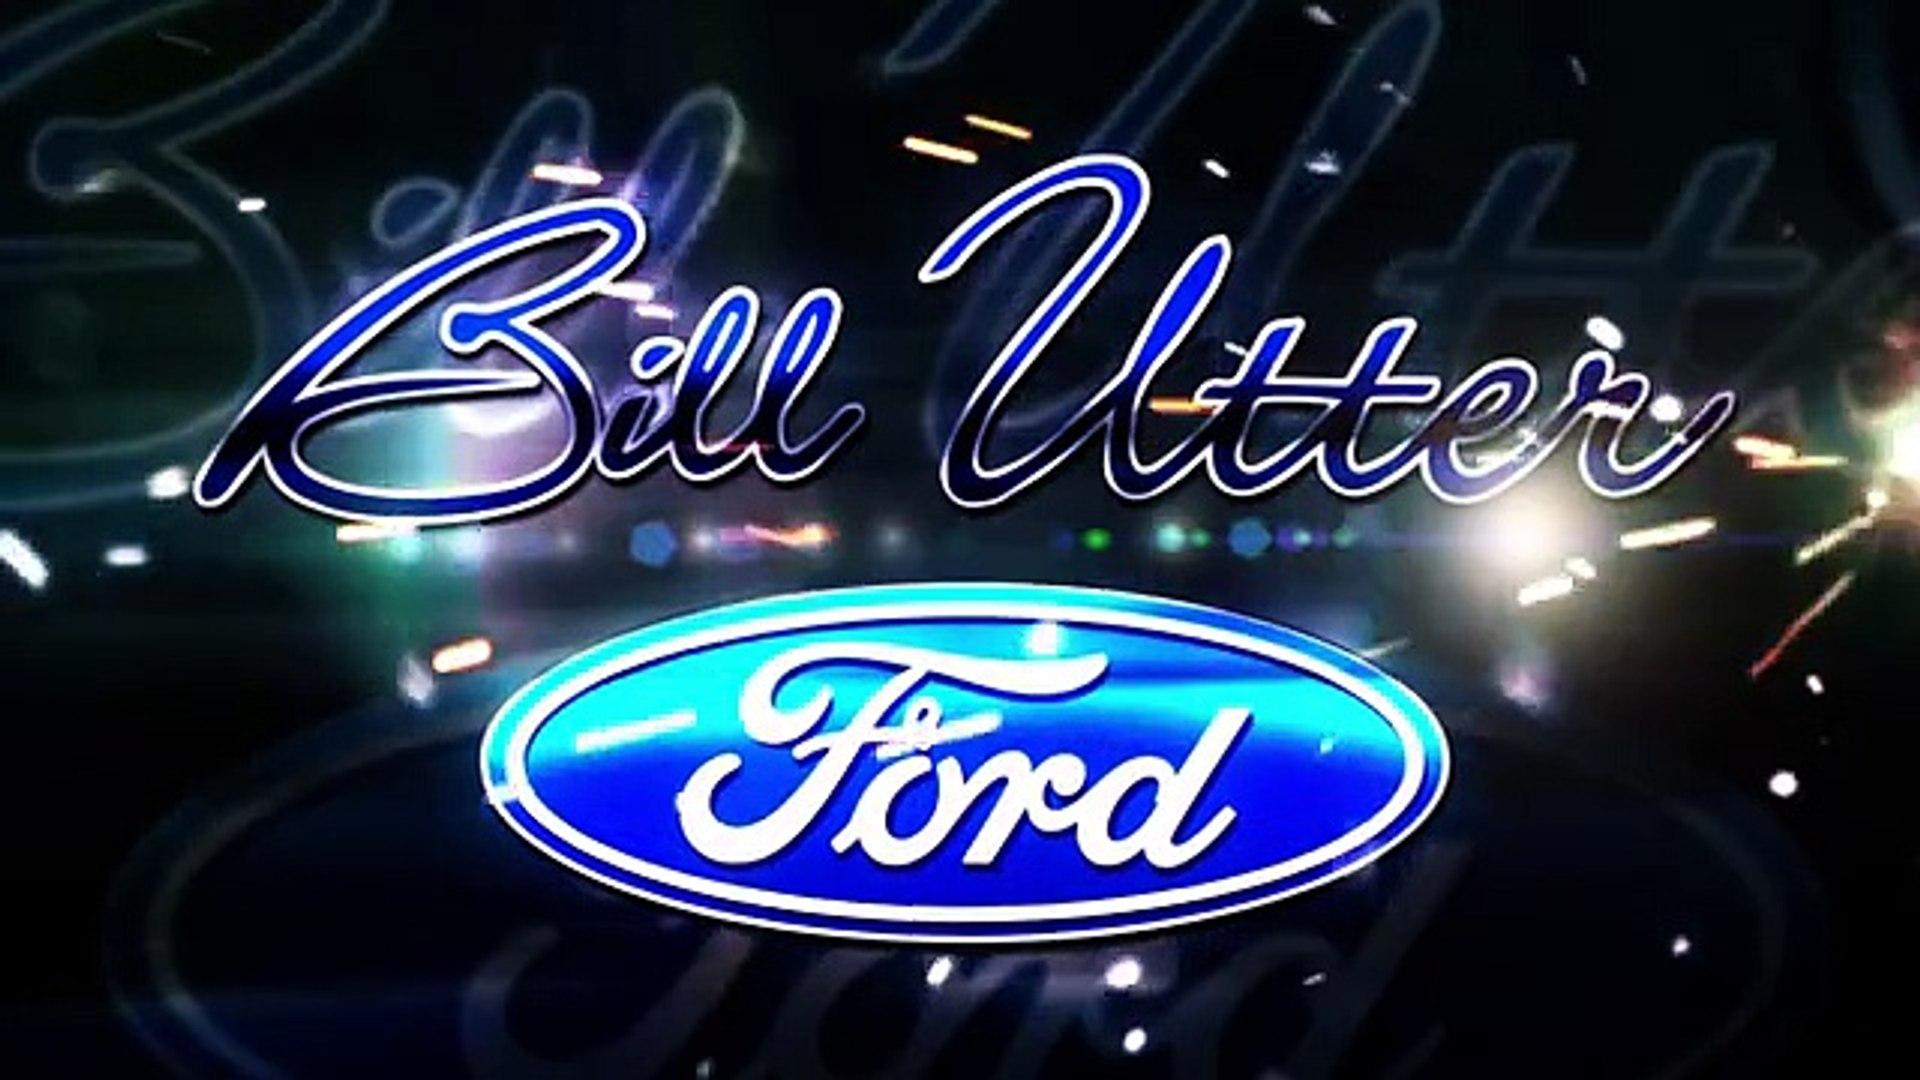 2017 Ford Flex Little Elm, TX | Ford Flex Little Elm, TX